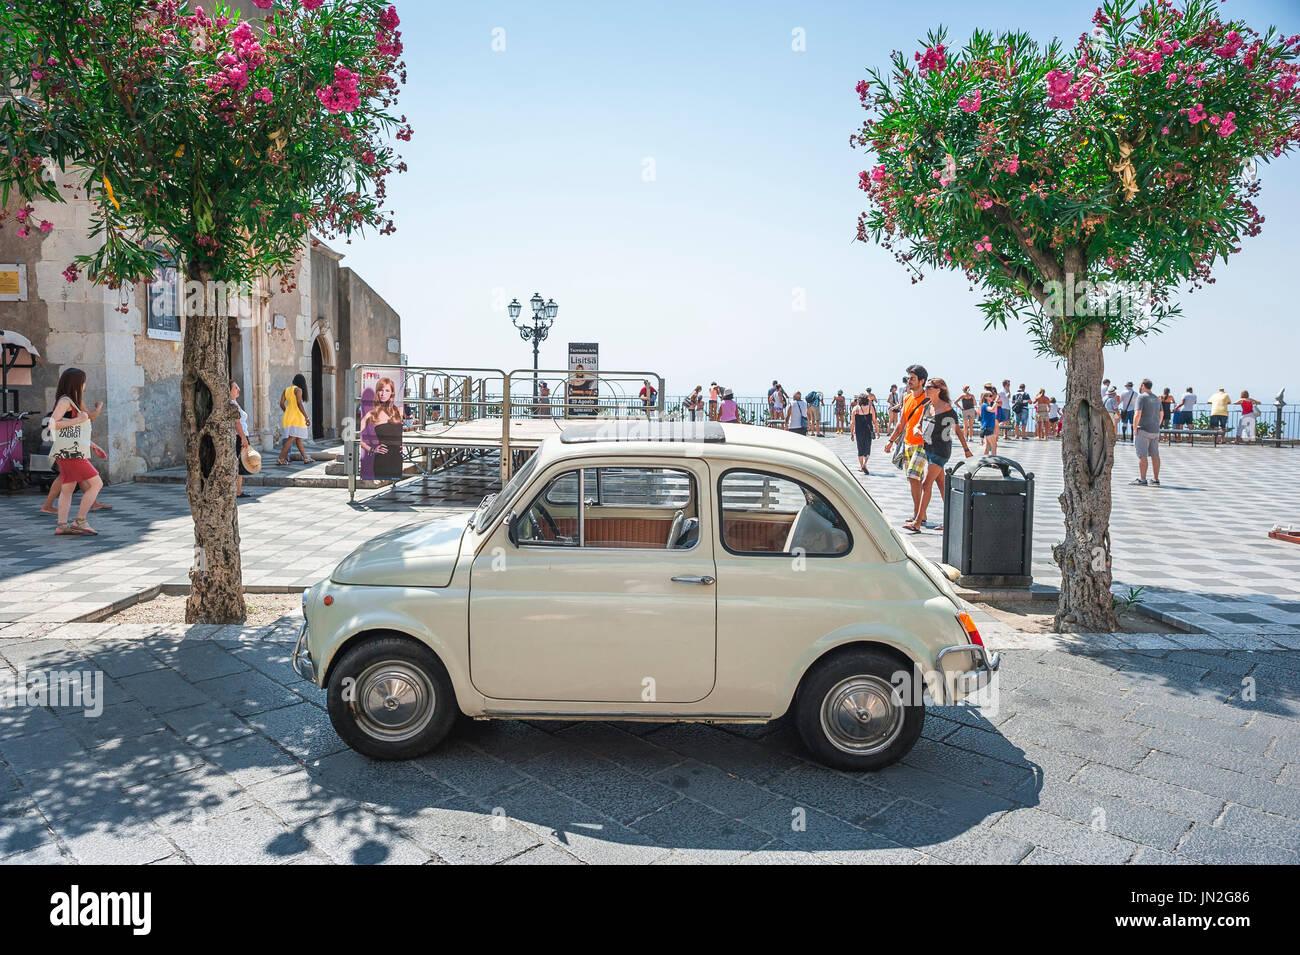 Fiat 500 old car, a classic Fiat 500 Cinquecento parked in the Piazza IX Aprile, Taormina, Sicily. - Stock Image